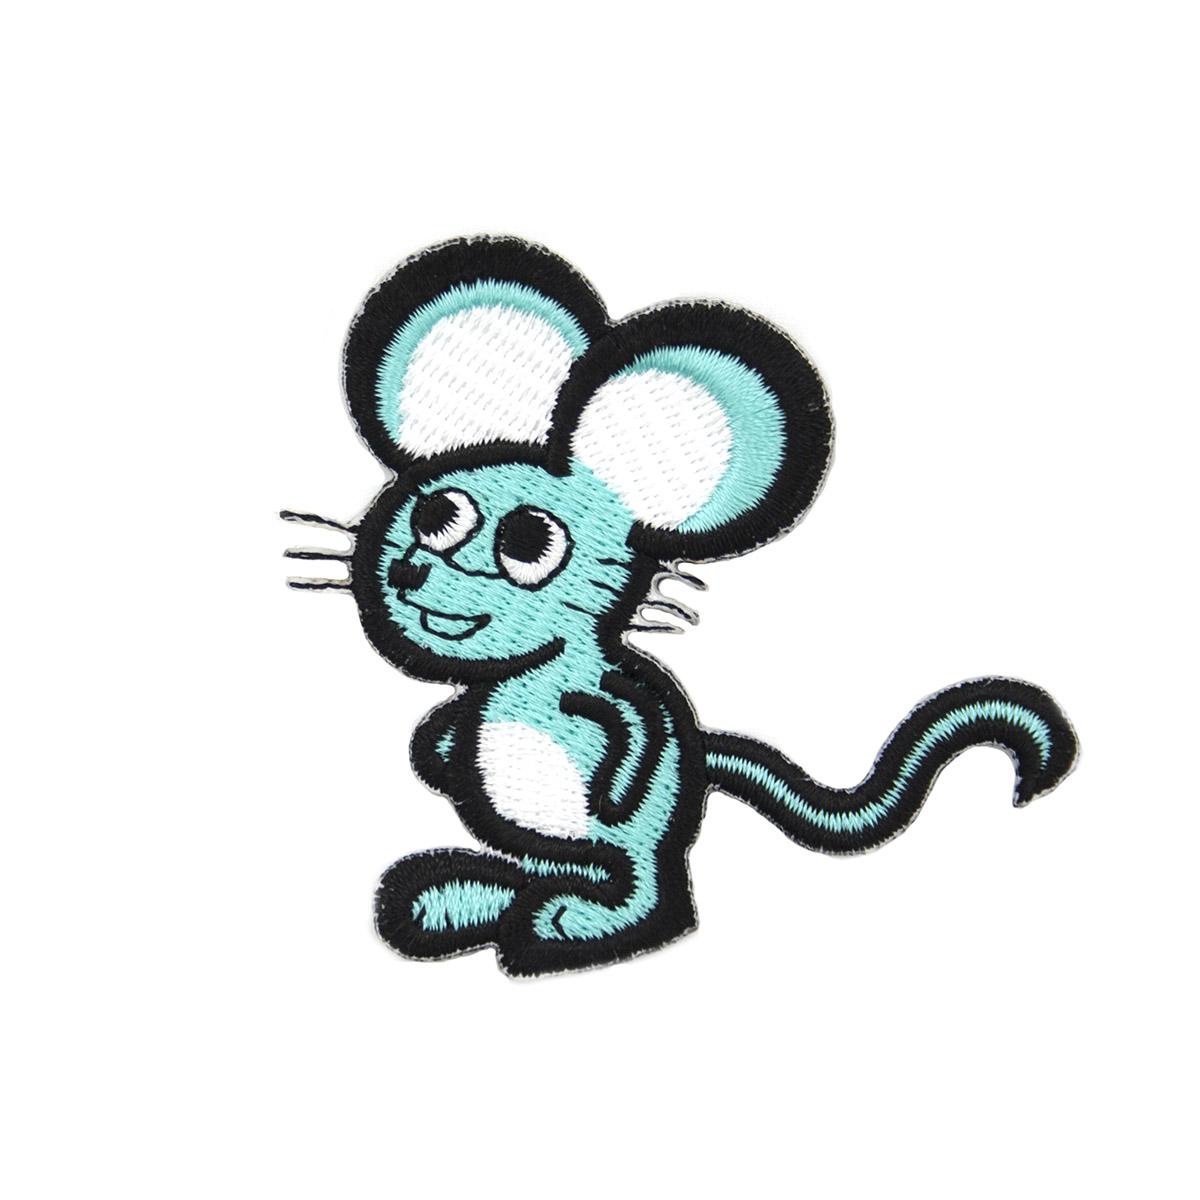 AD1162 Термоаппликация 'Мышь', 6*6 см, Hobby&Pro